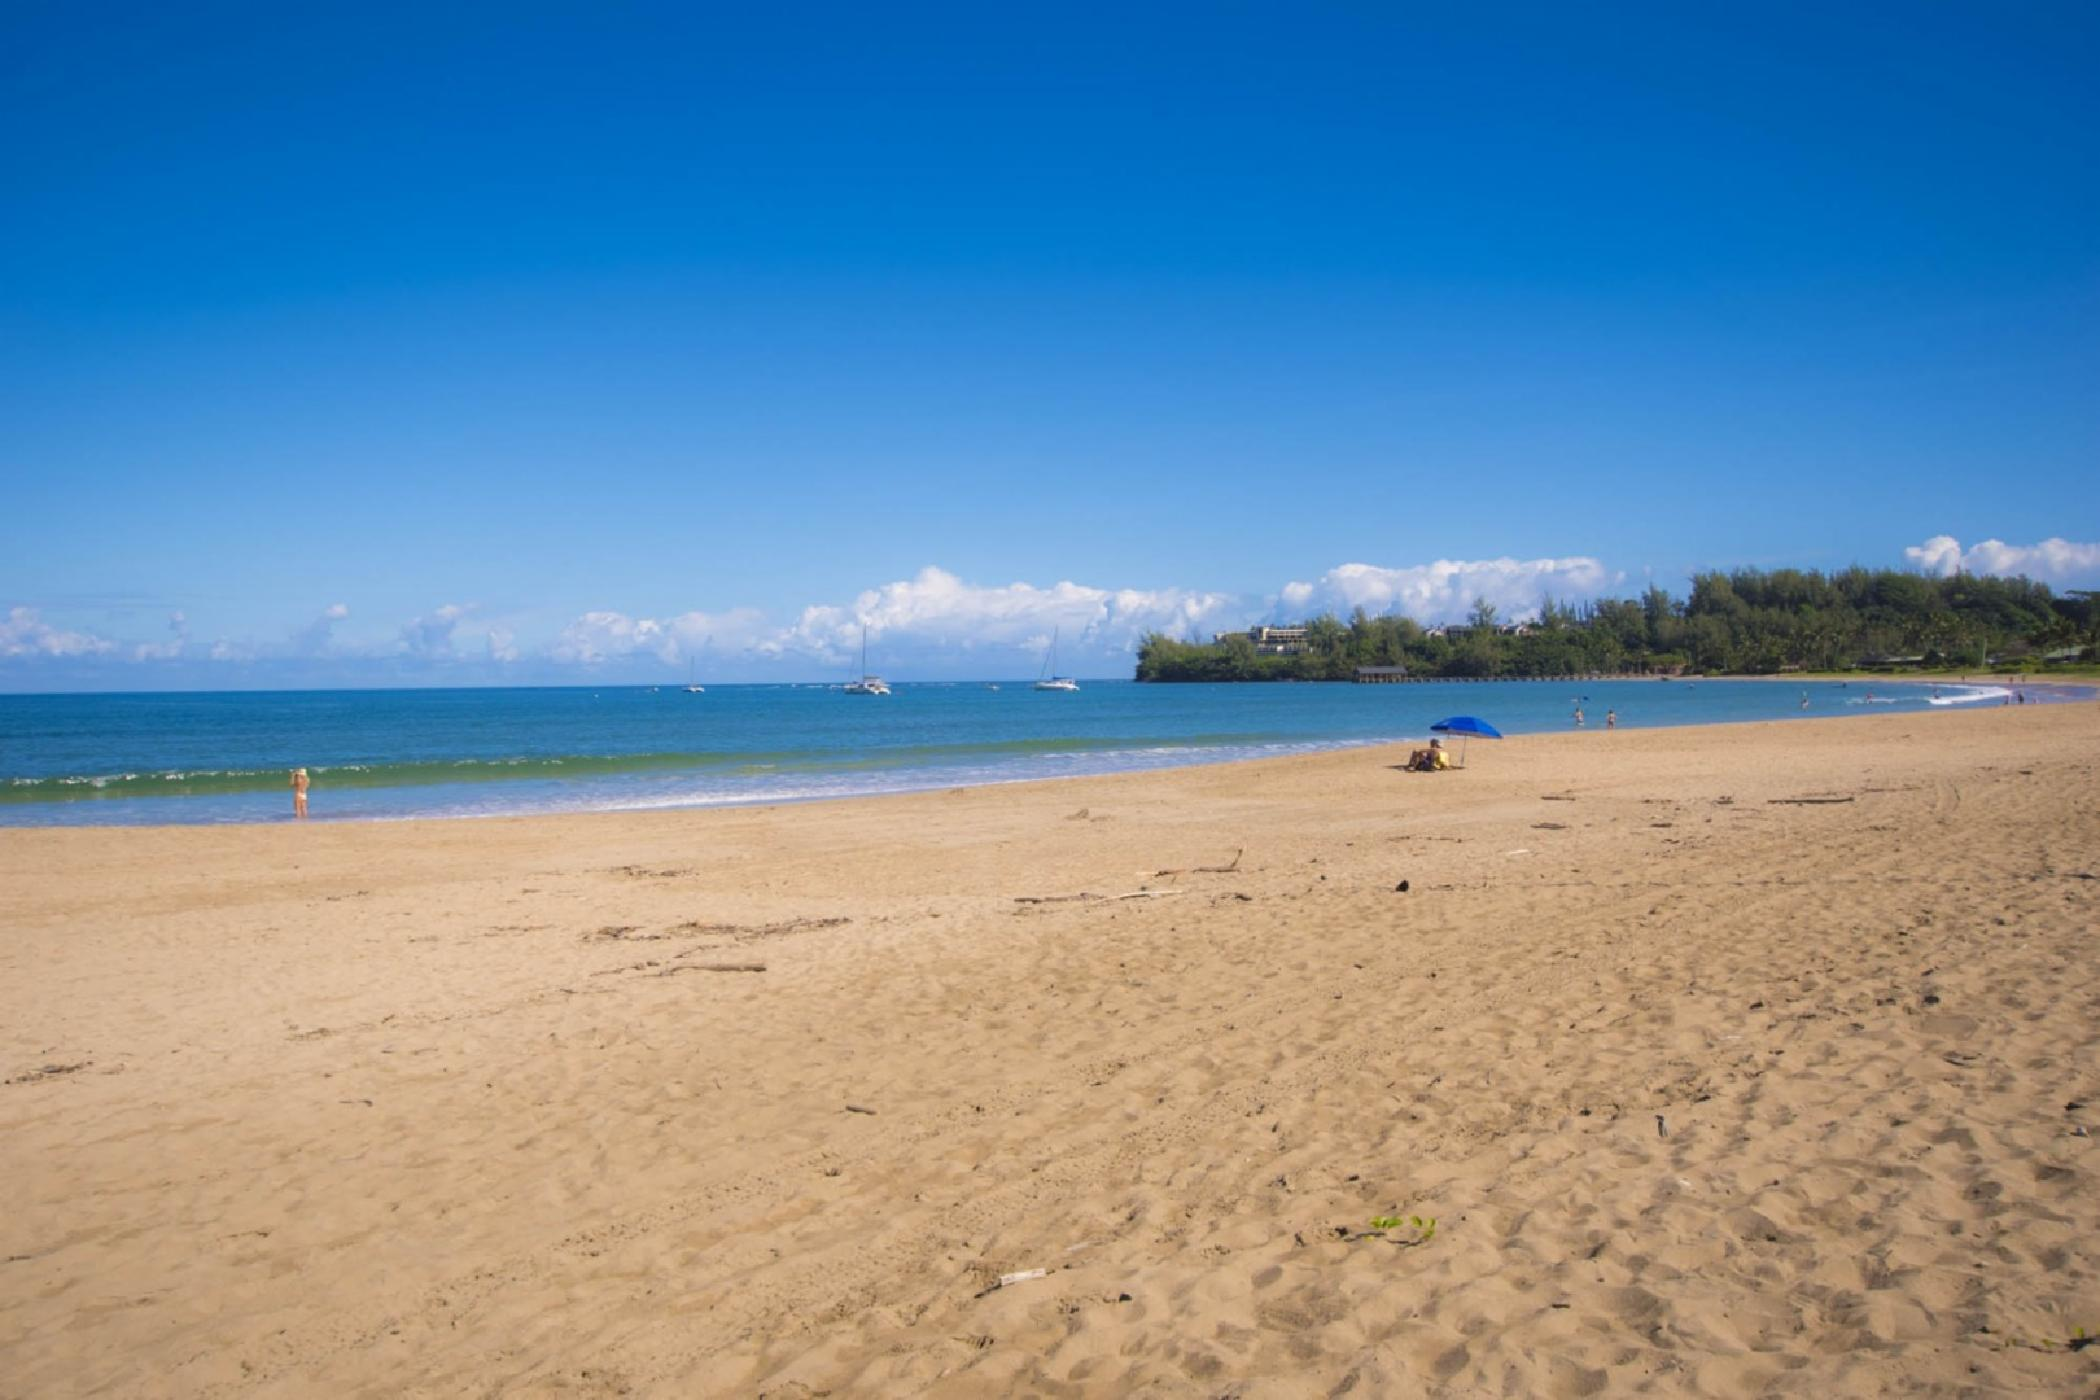 beach-toward-pier.jpeg